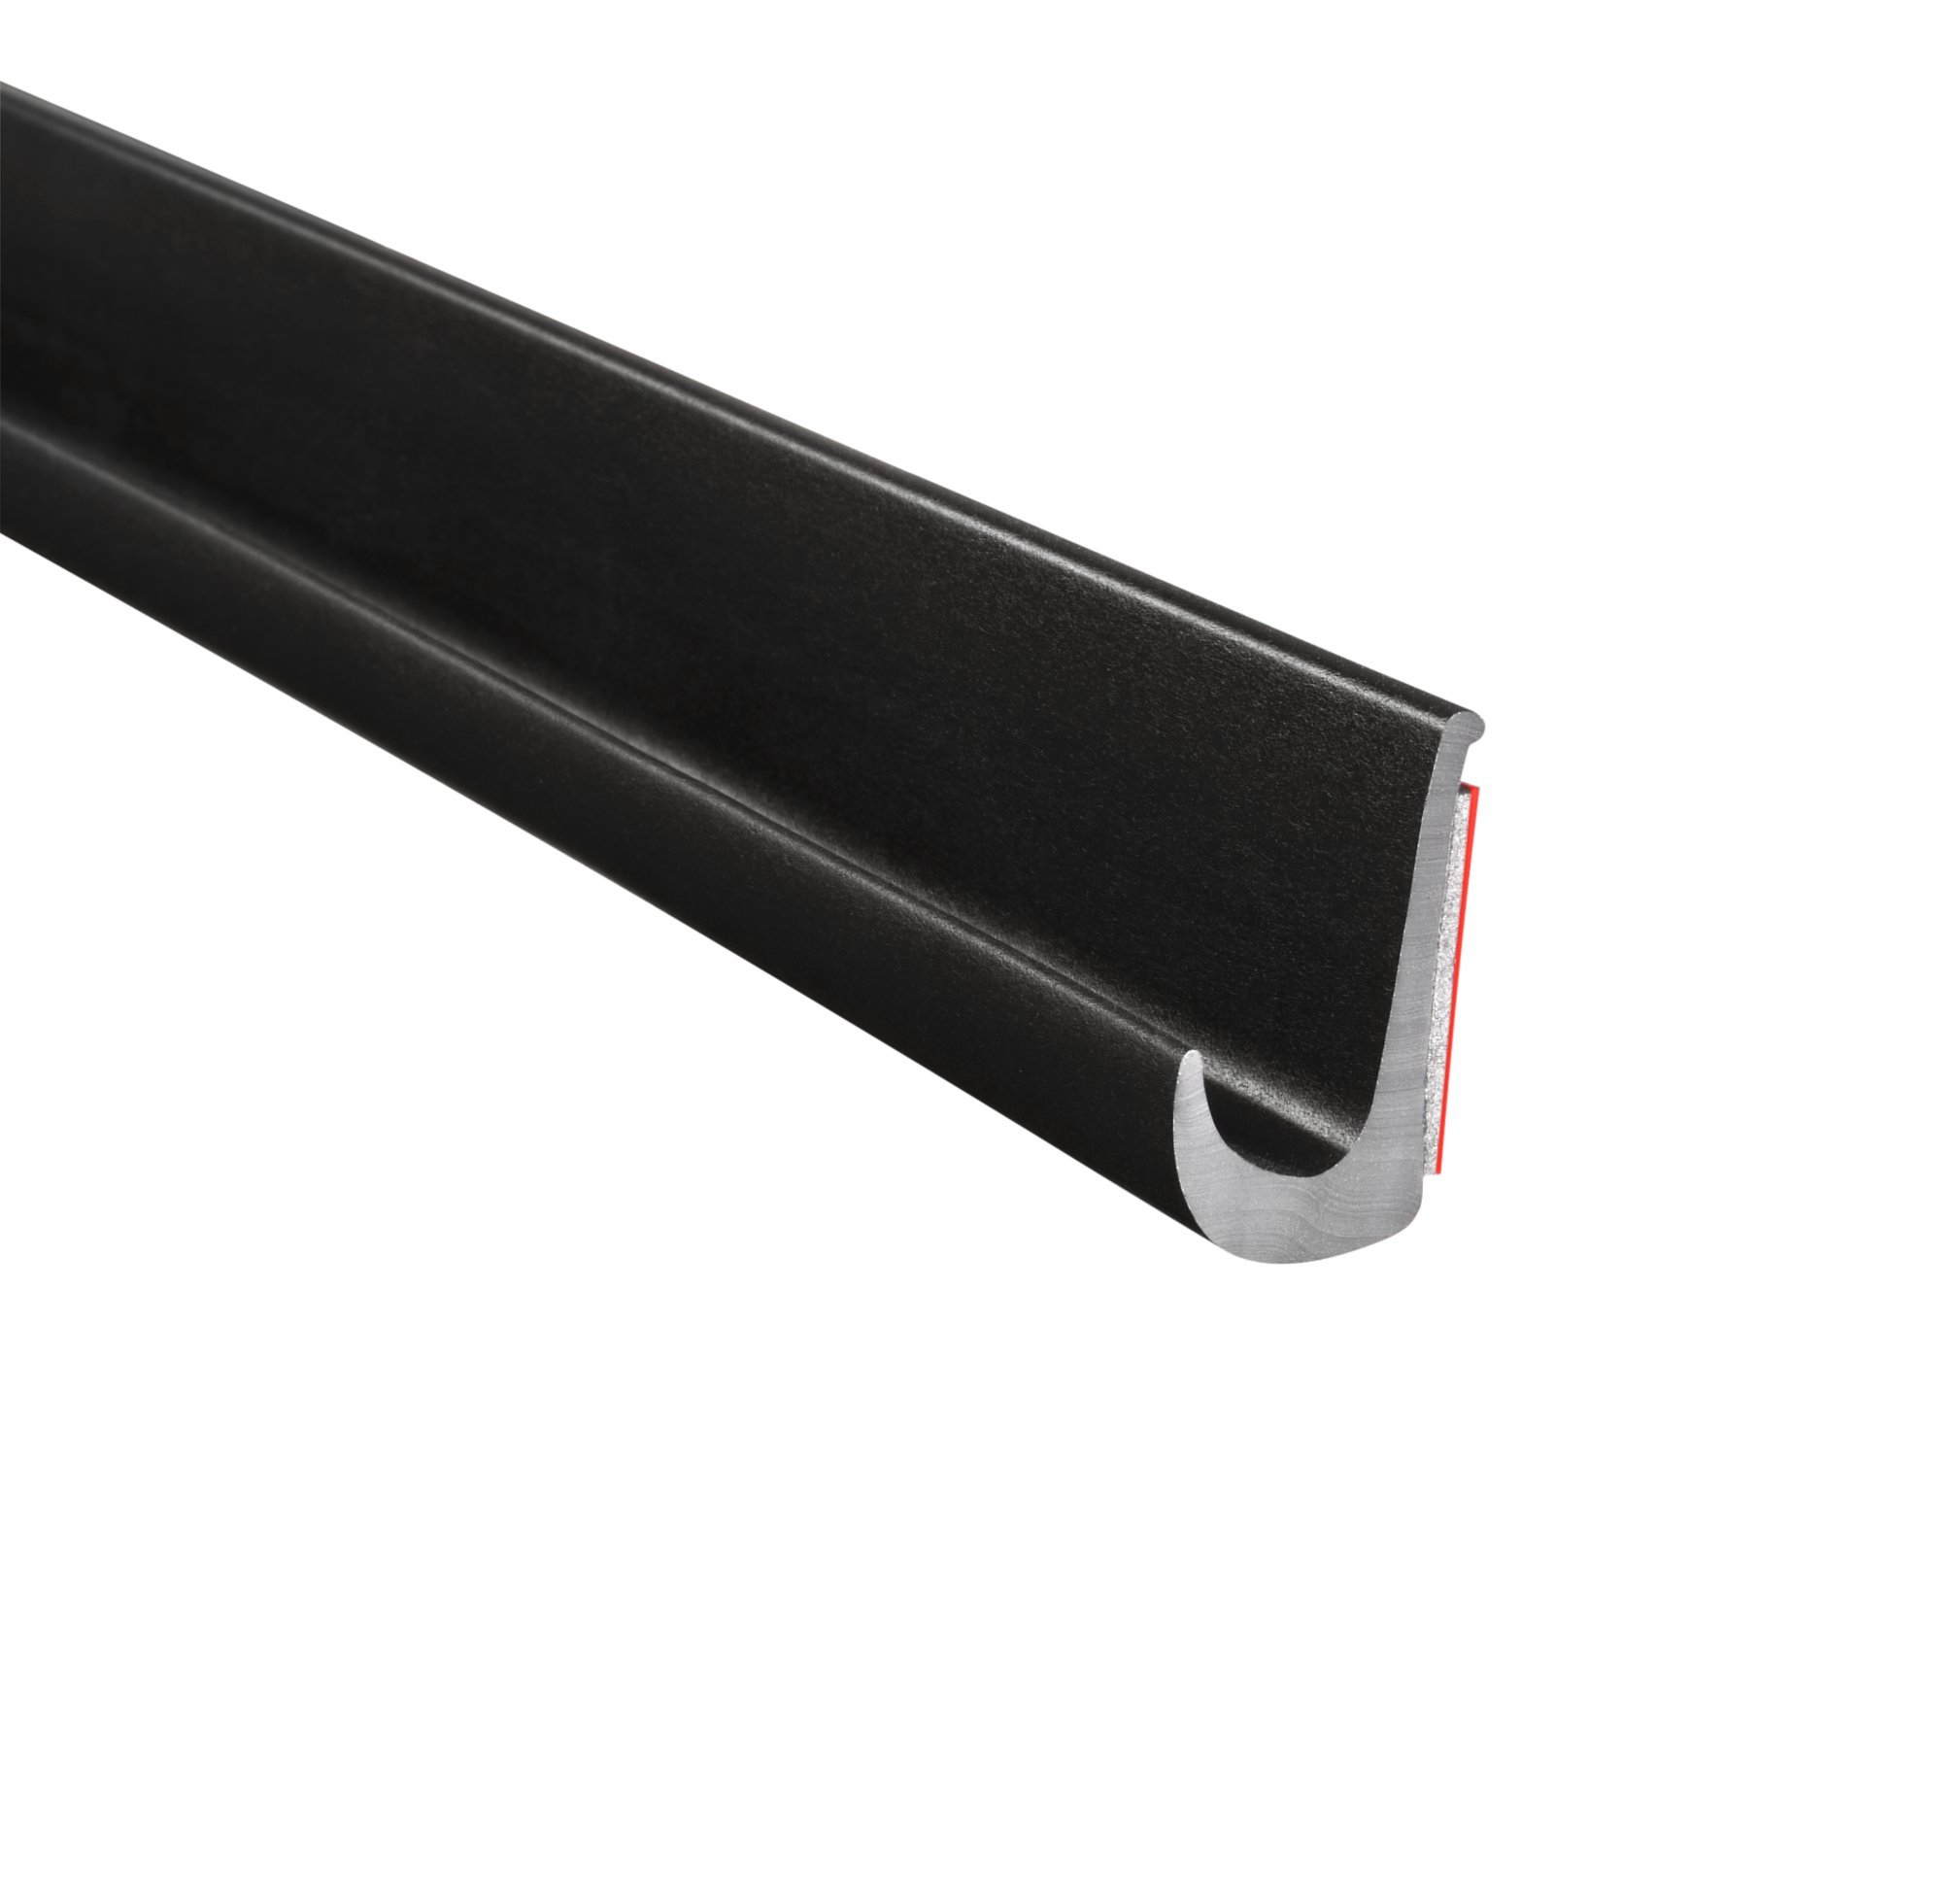 "Trim-Lok Drip Rail – Black, PVC Plastic Rain Gutter for Cars, Vans, and RVs – Installs with Durable 3M Tape – 1/2"" Height, 125' Length"